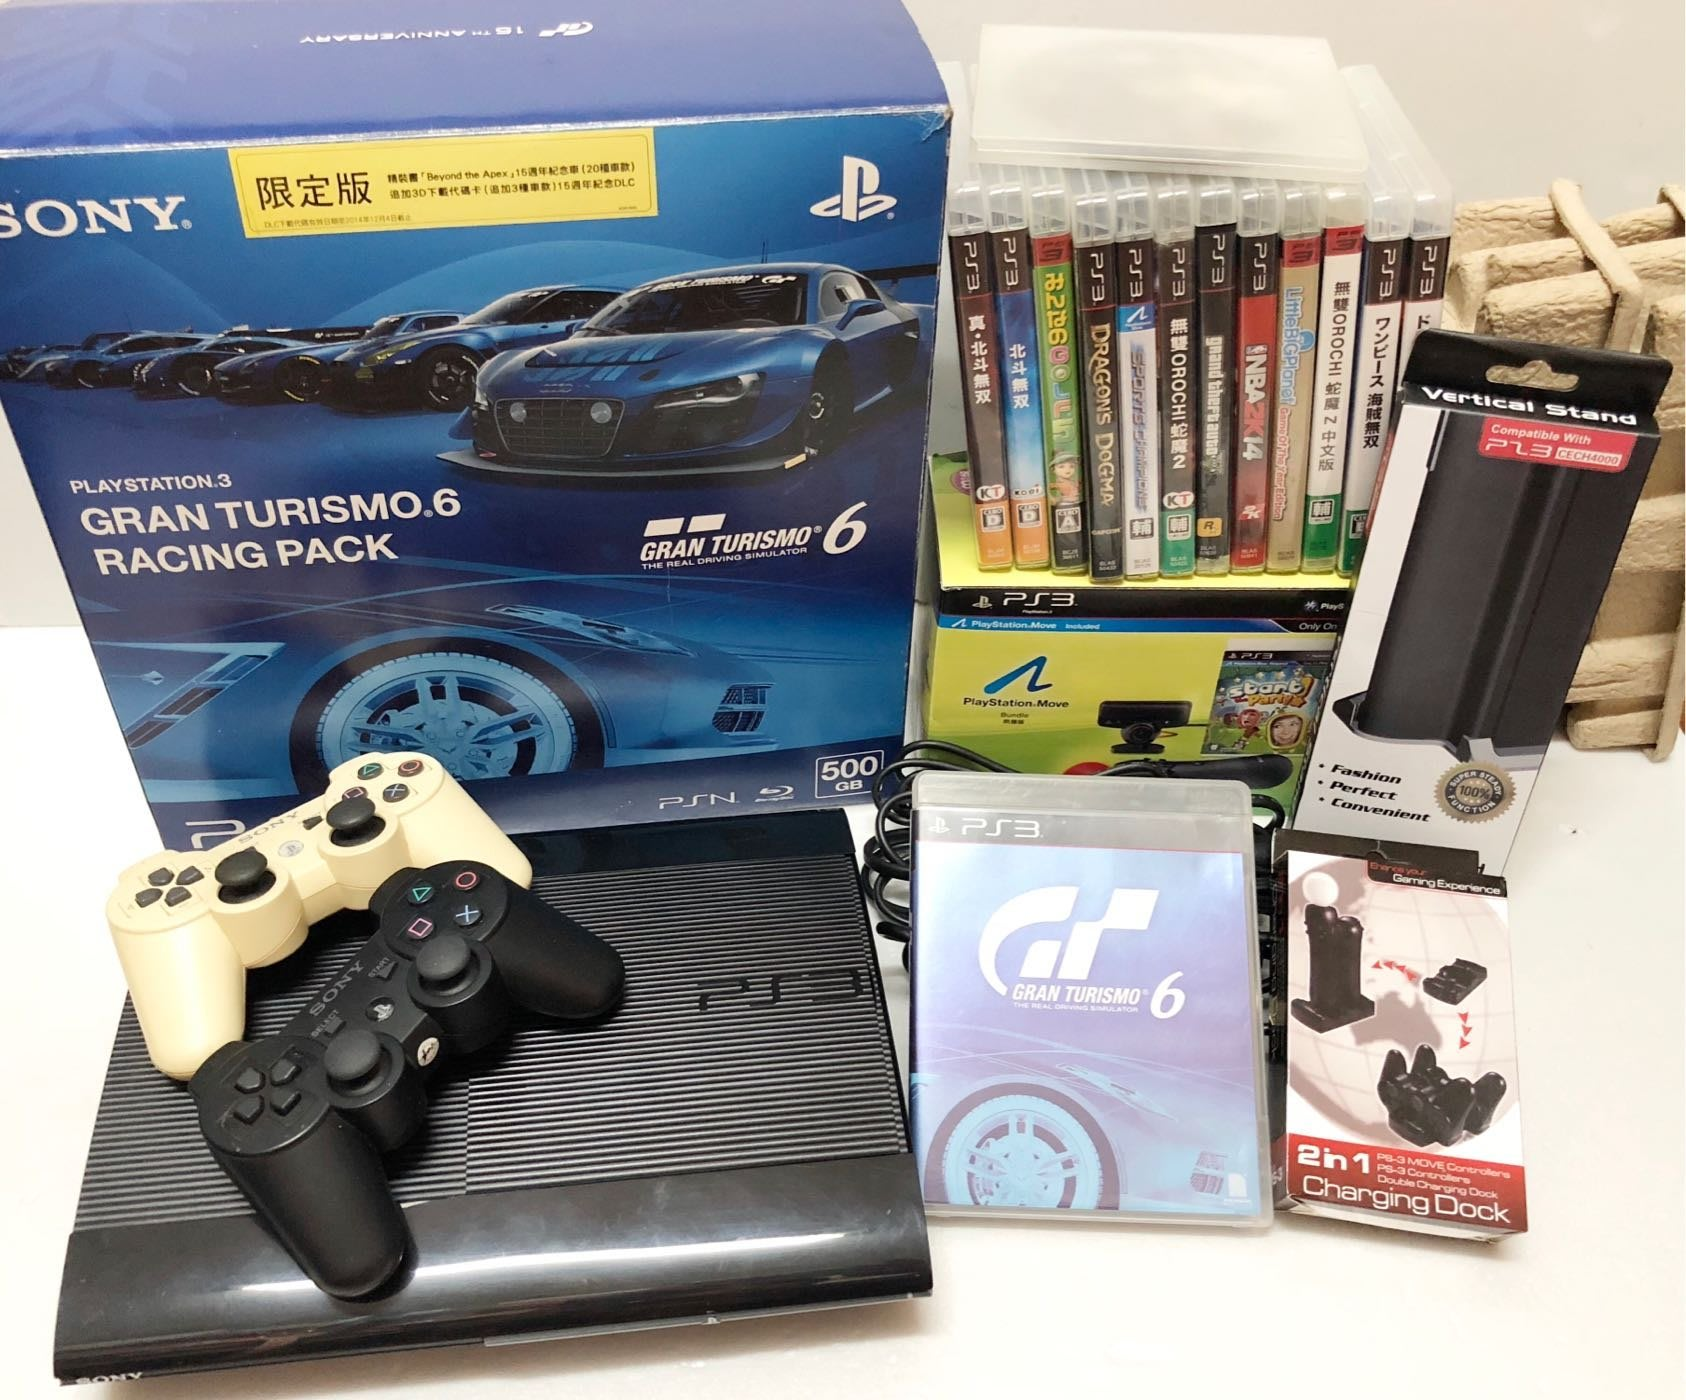 Sony PlayStation3 Slim GT6 同捆限量版CECH-4007C 500GB 、原廠手把*2、遊戲x14、PS Move 組合